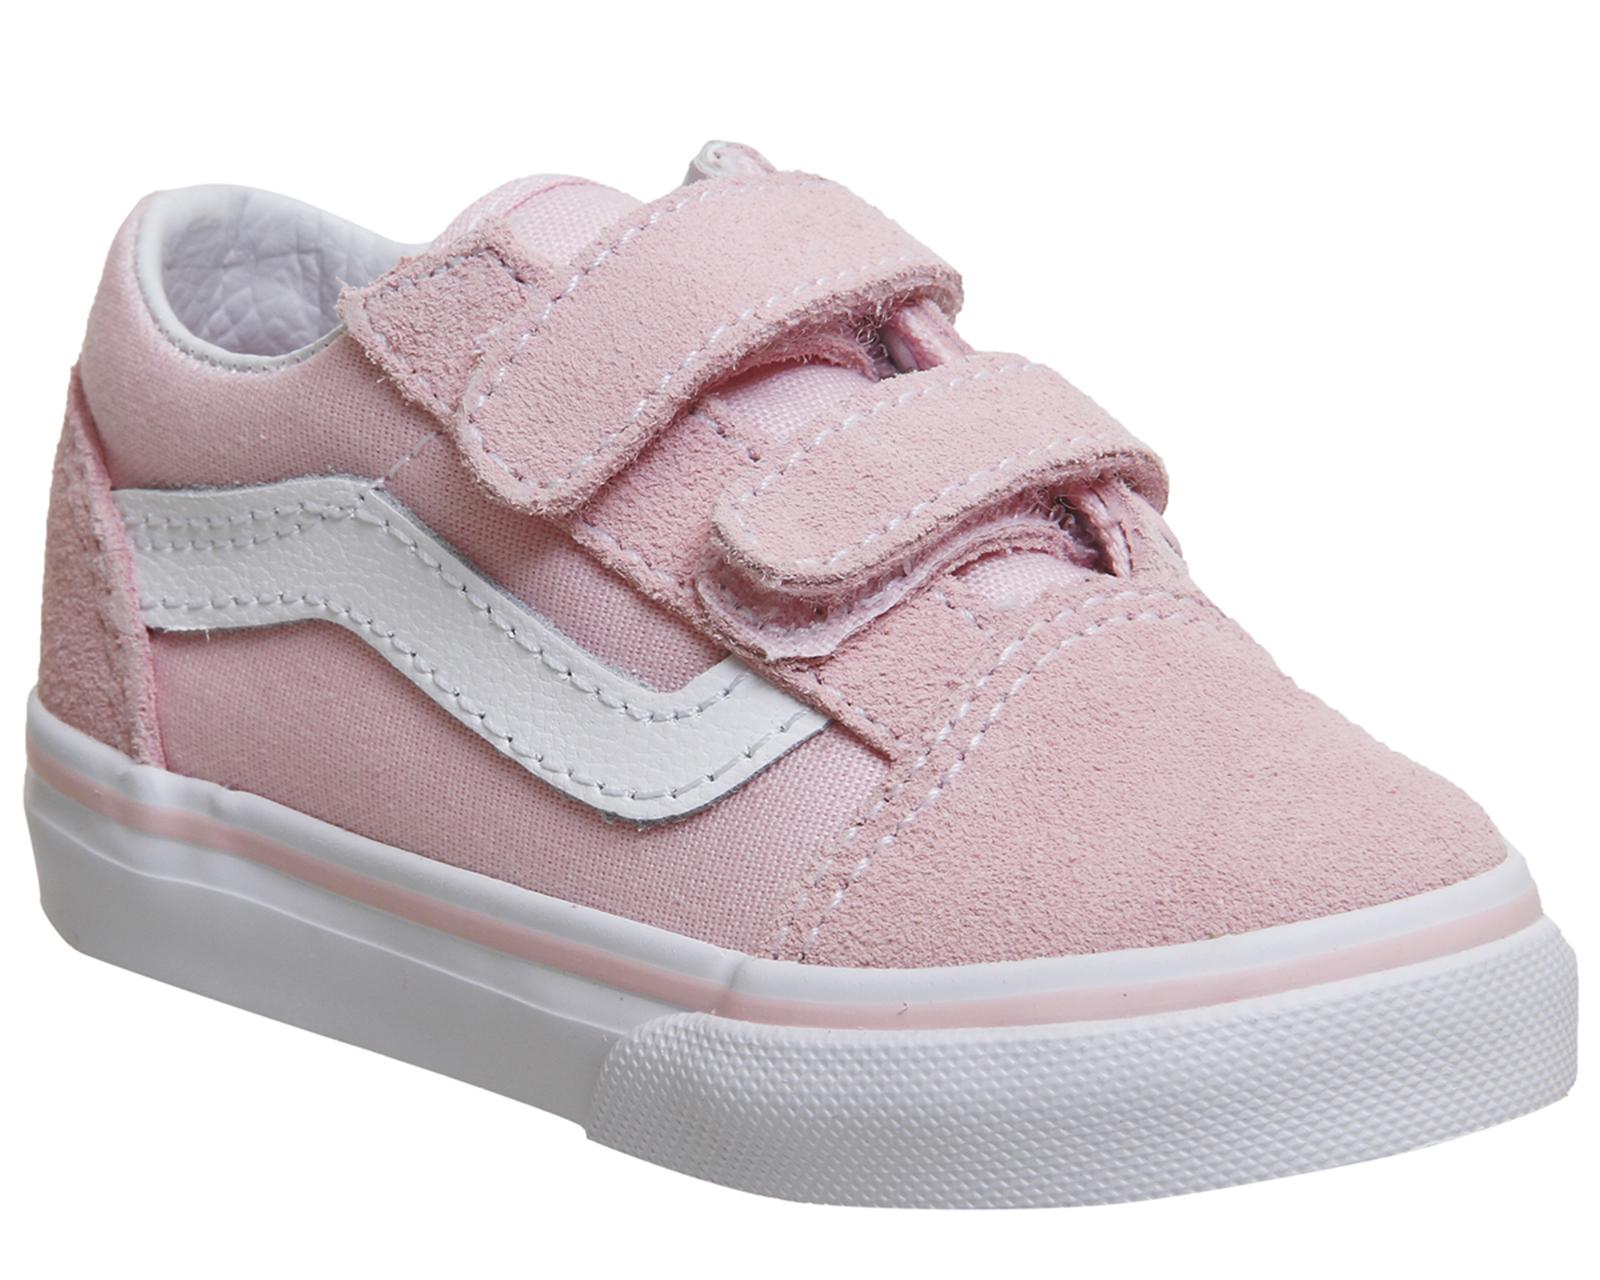 Kids Vans Pink Canvas Strap Trainers Uk Size 4 Infant Ex Display